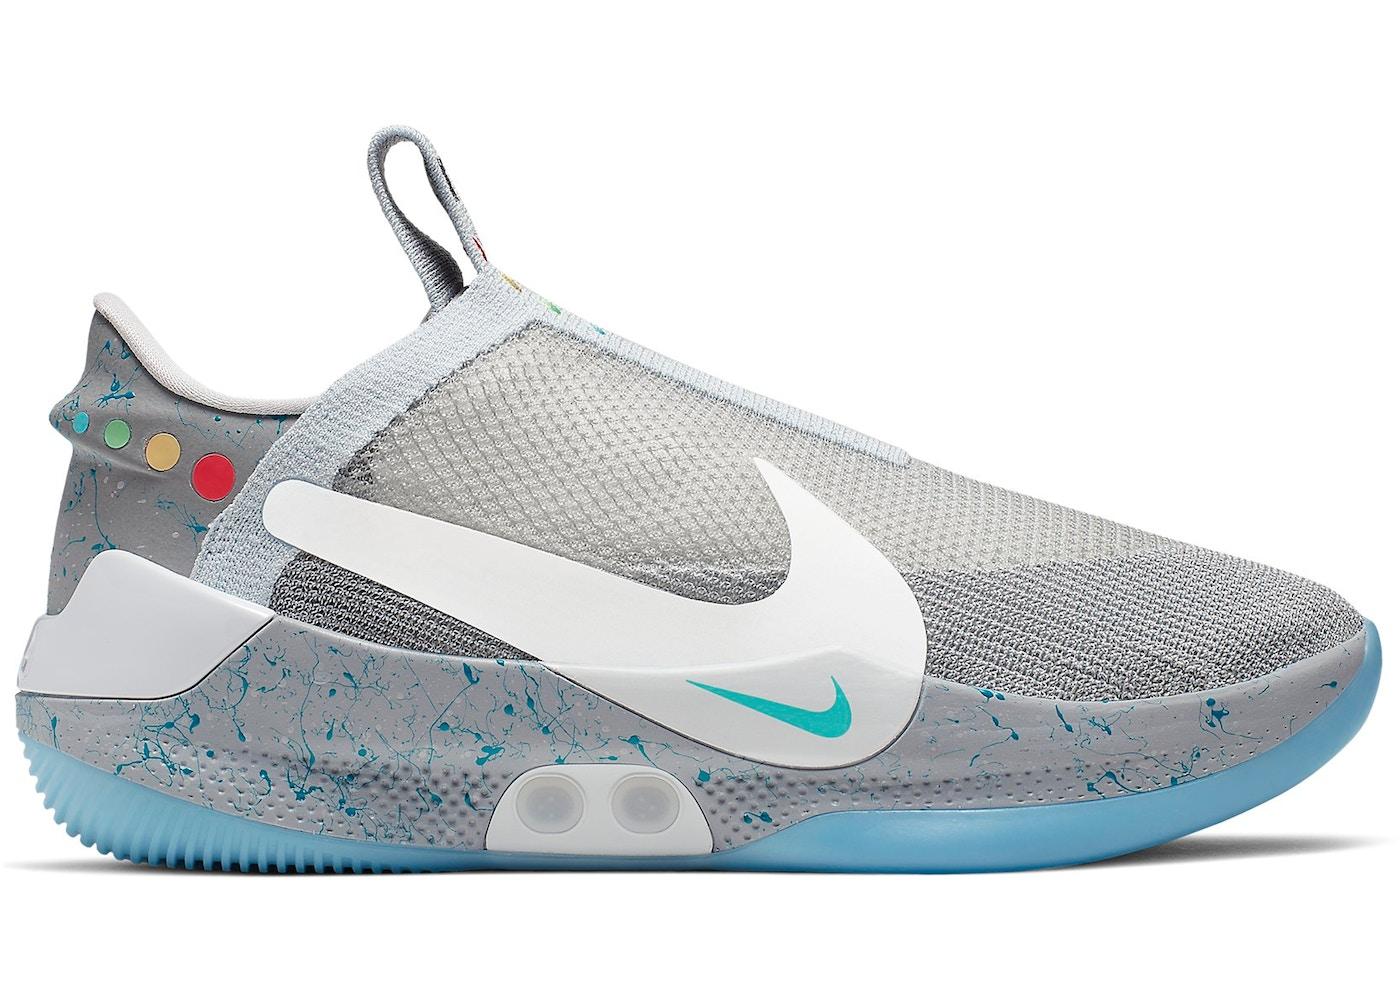 Nike Adapt Bb Mag Uk Charger Ck0893 090